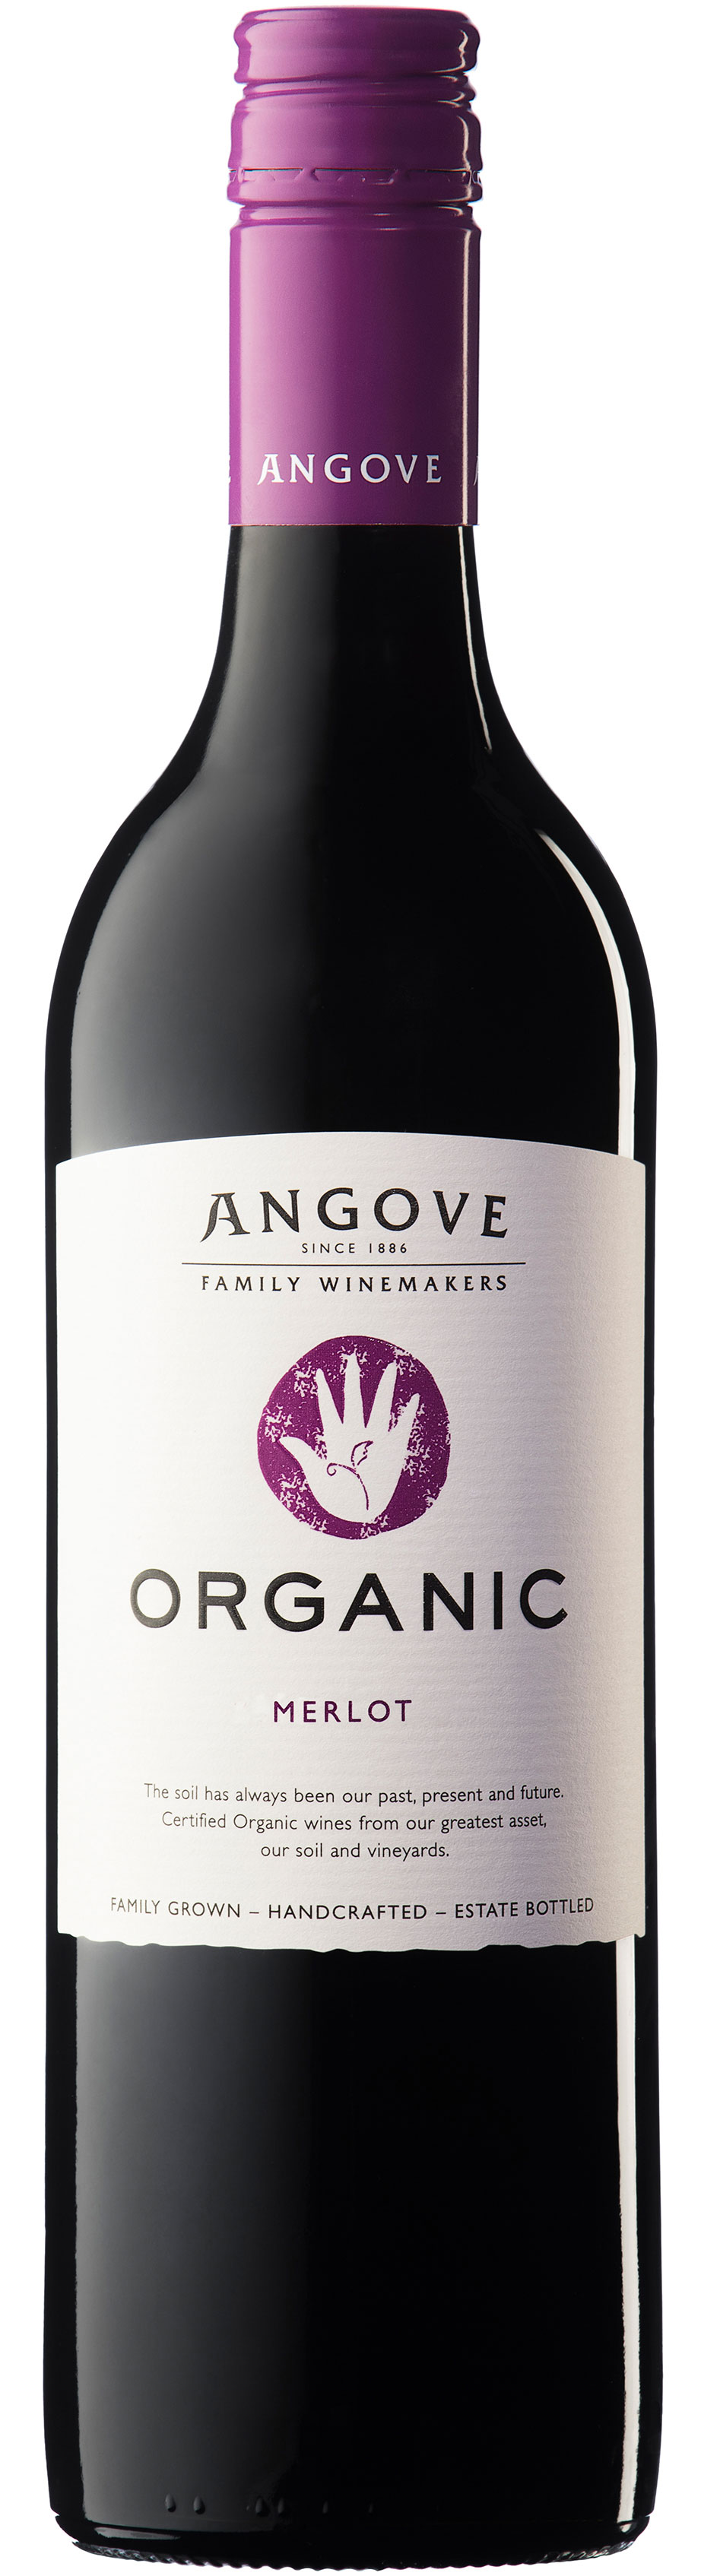 https://vinocorpperu.com/images/vinos/angove/angove_organic_merlot_2019.jpg